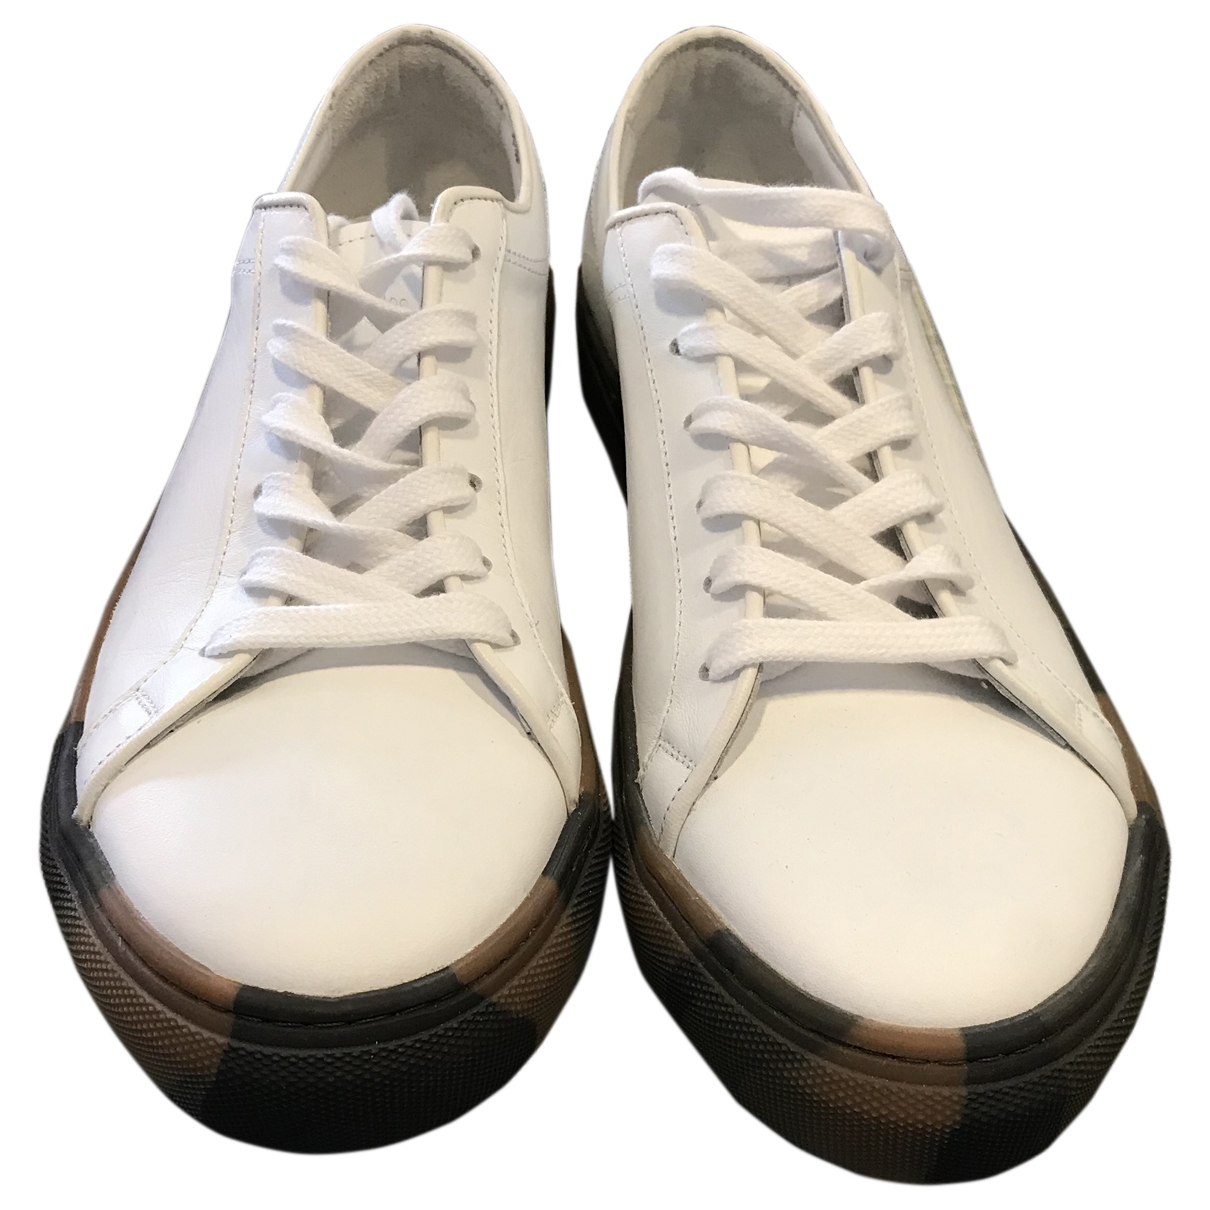 Paul & Joe \N White Leather Trainers for Men 43 EU